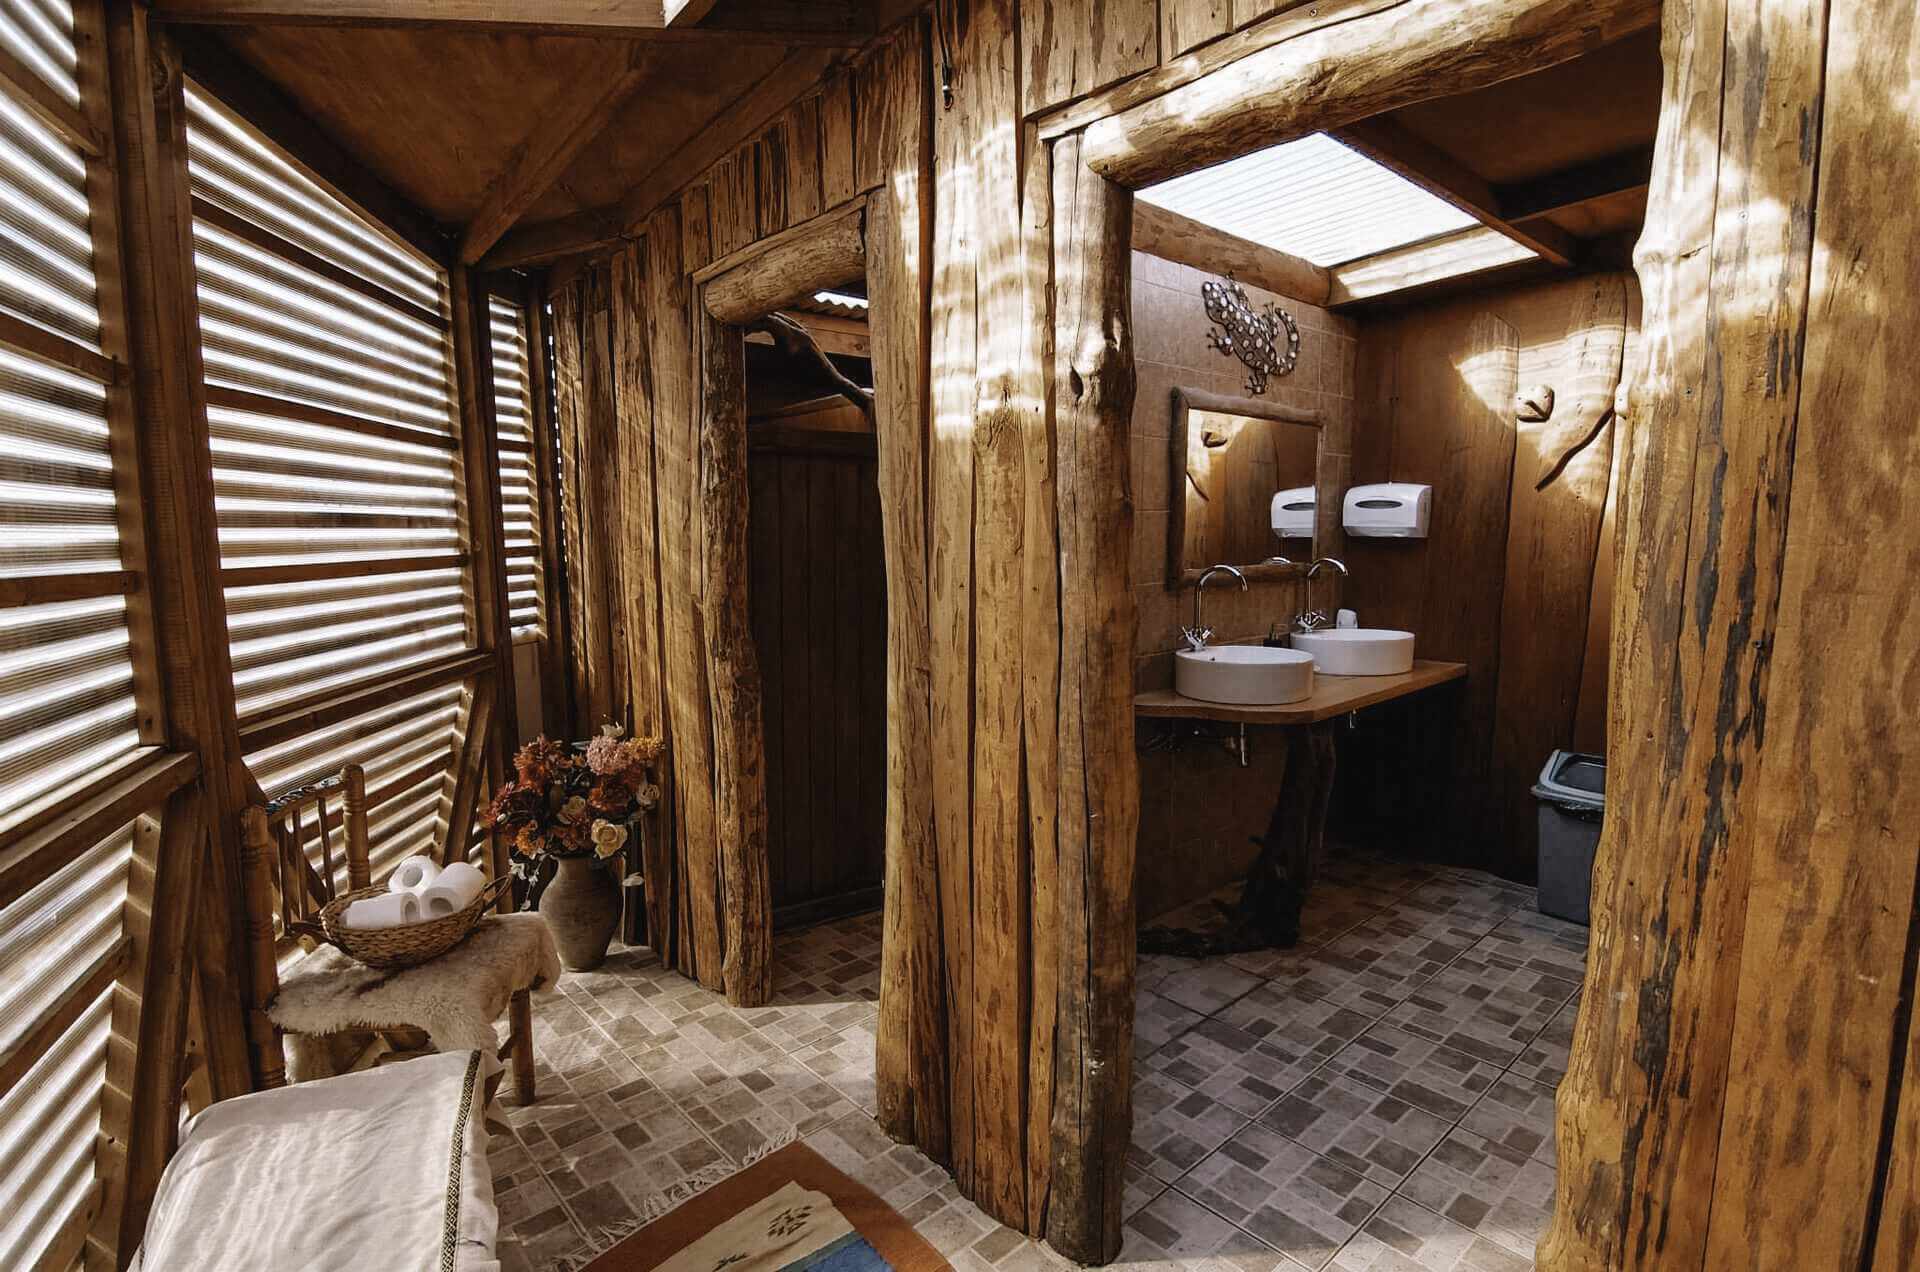 Standard Dome Shared Bathroom